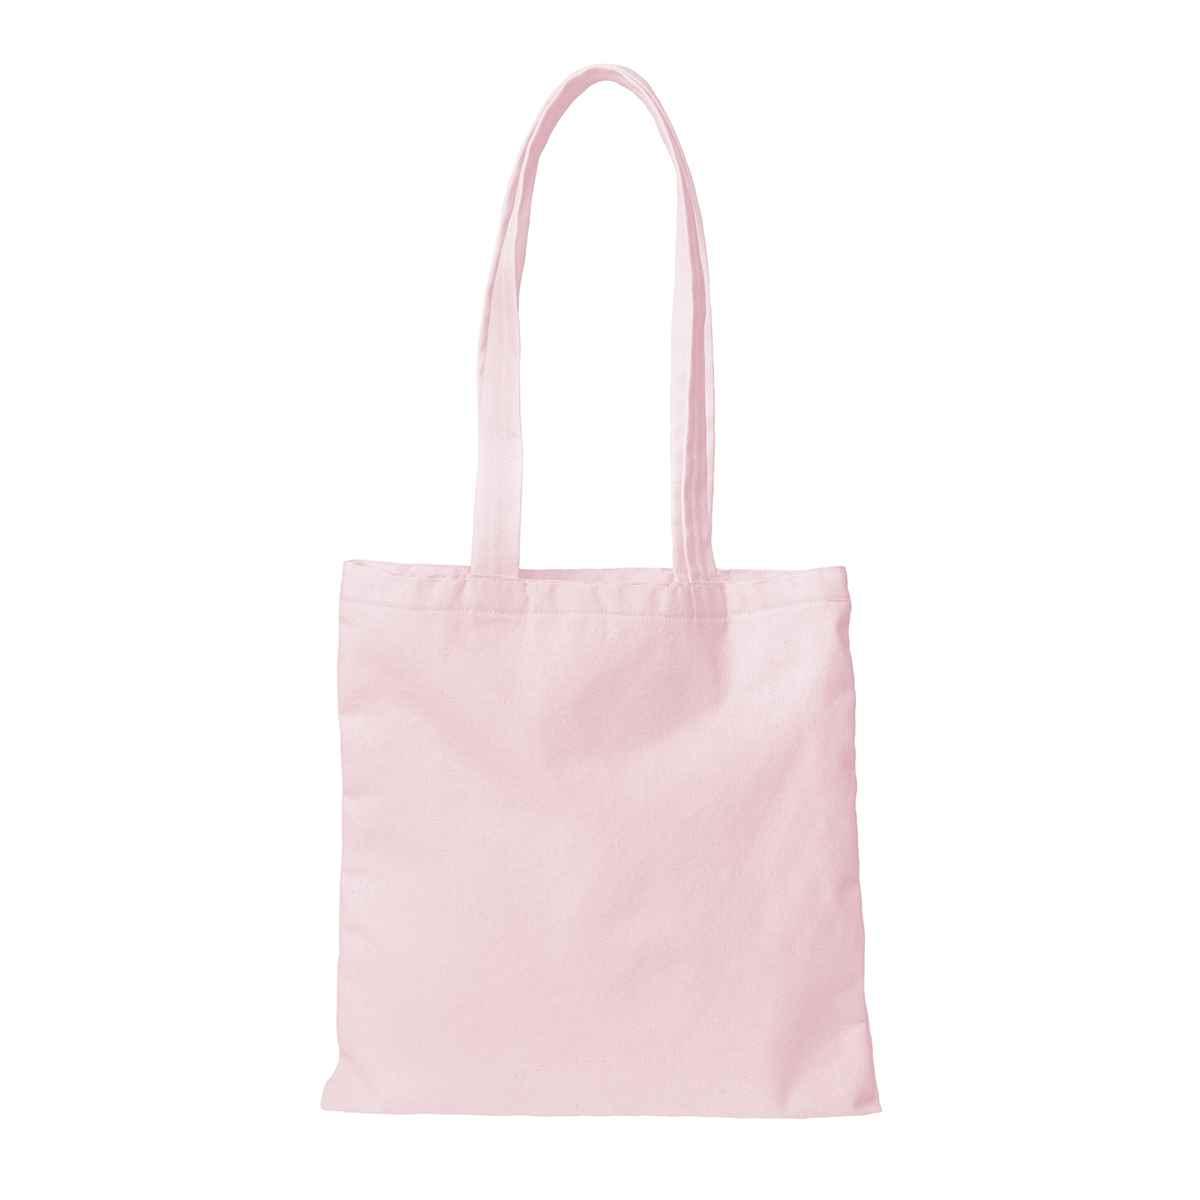 045001 fairytale pink